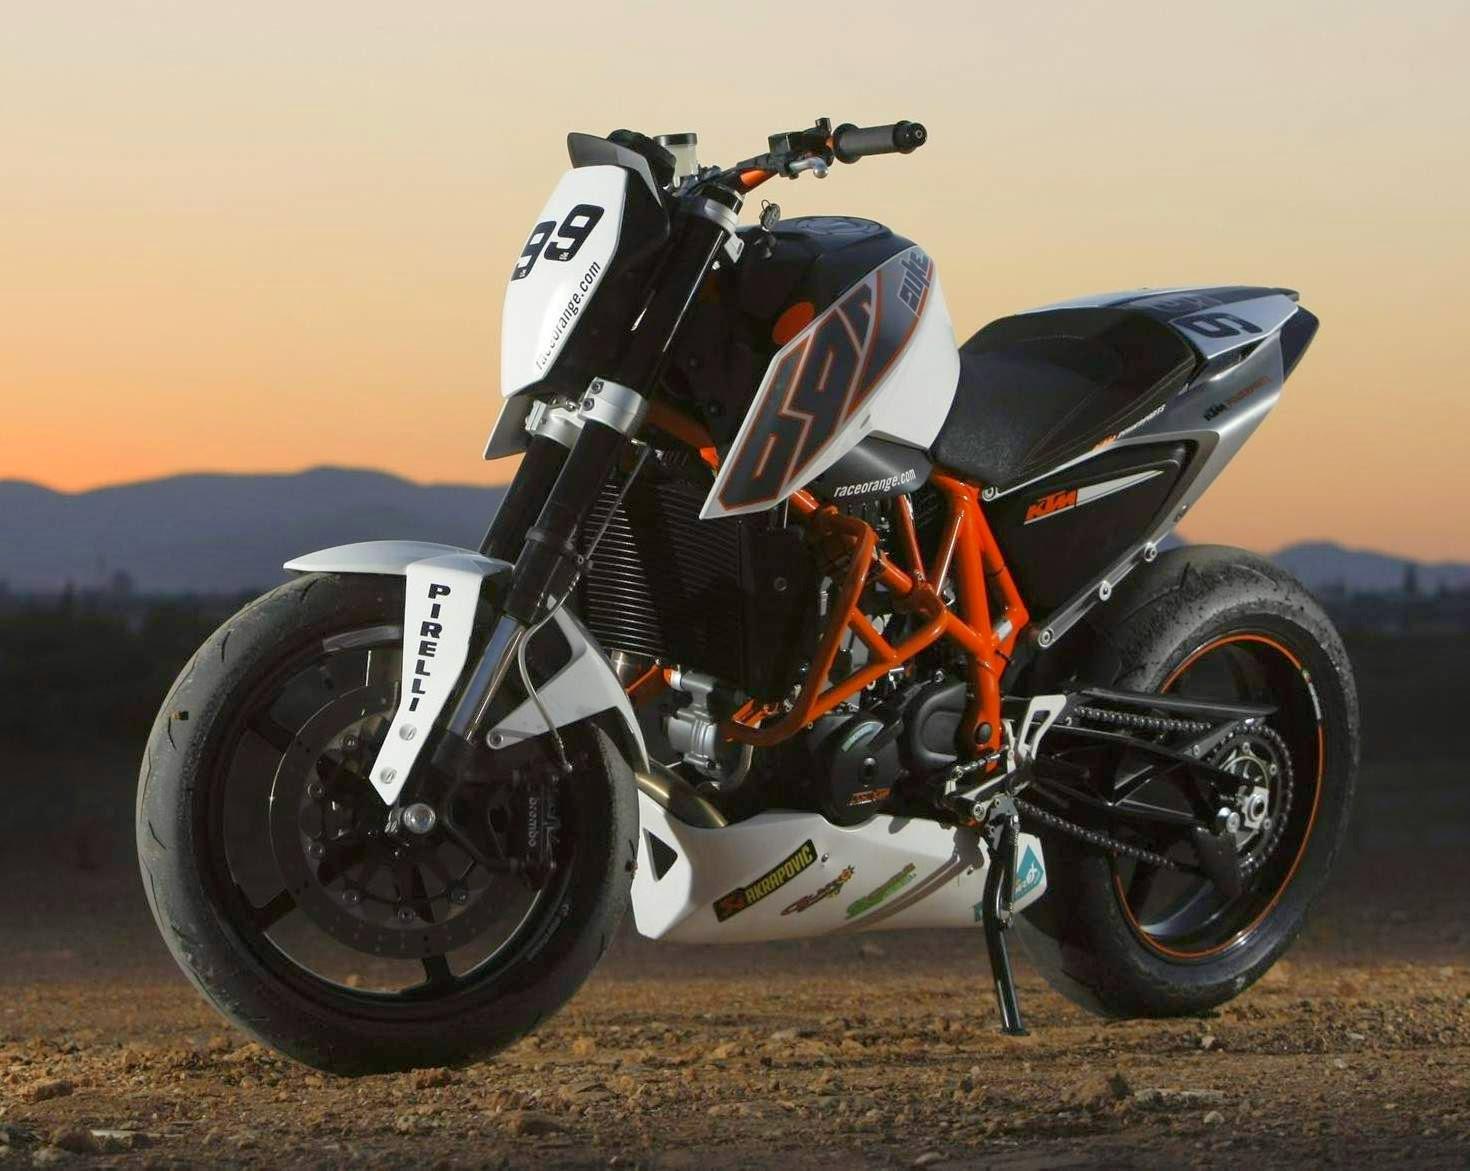 Bike Cars HD Wallpapers KTM 690 Duke ABS Motorcycle HD 1470x1171